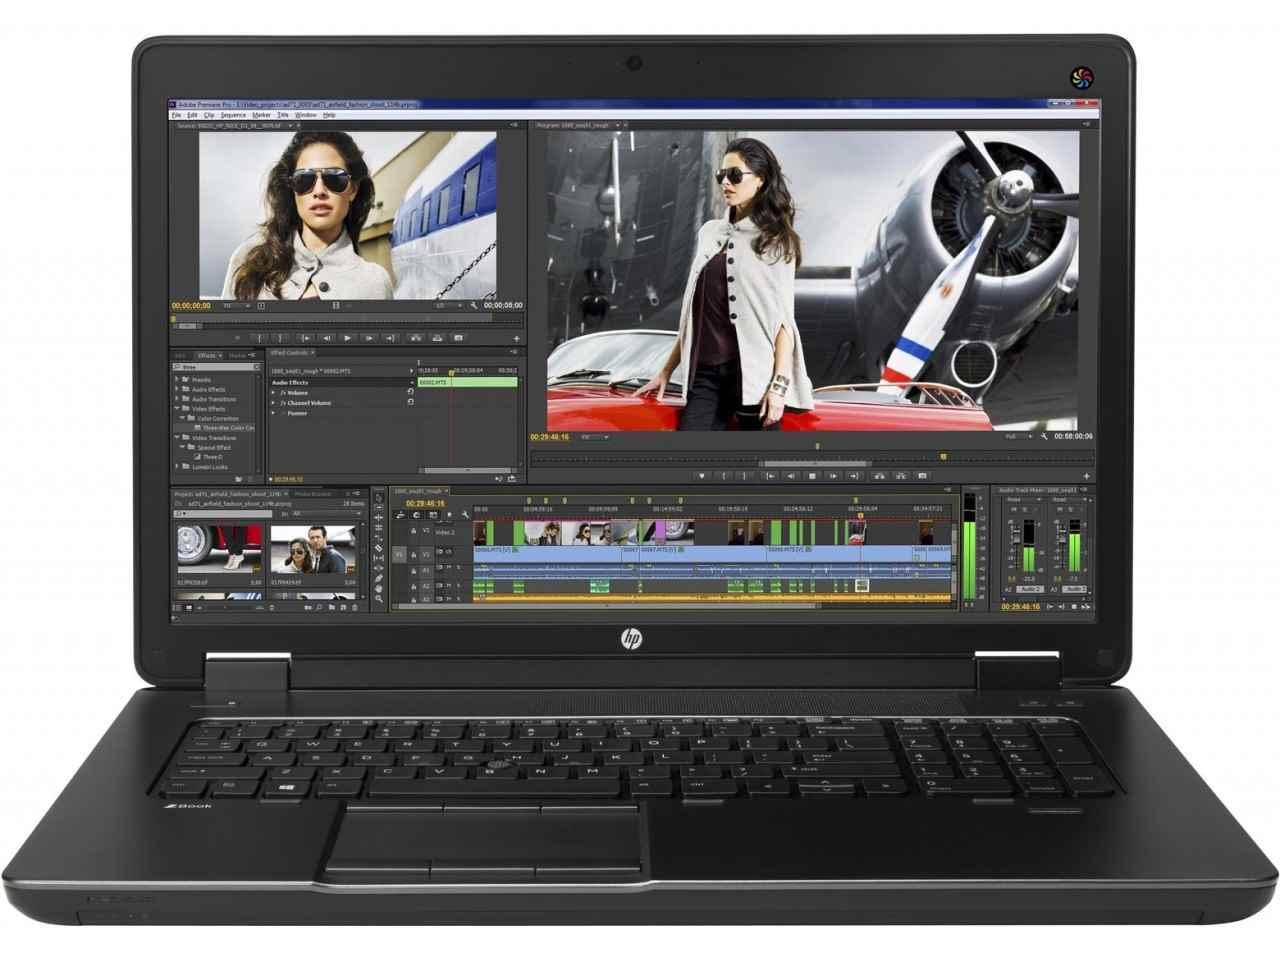 لپ تاپ استوک اچ پی مدل HP ZBOOK 17 G2